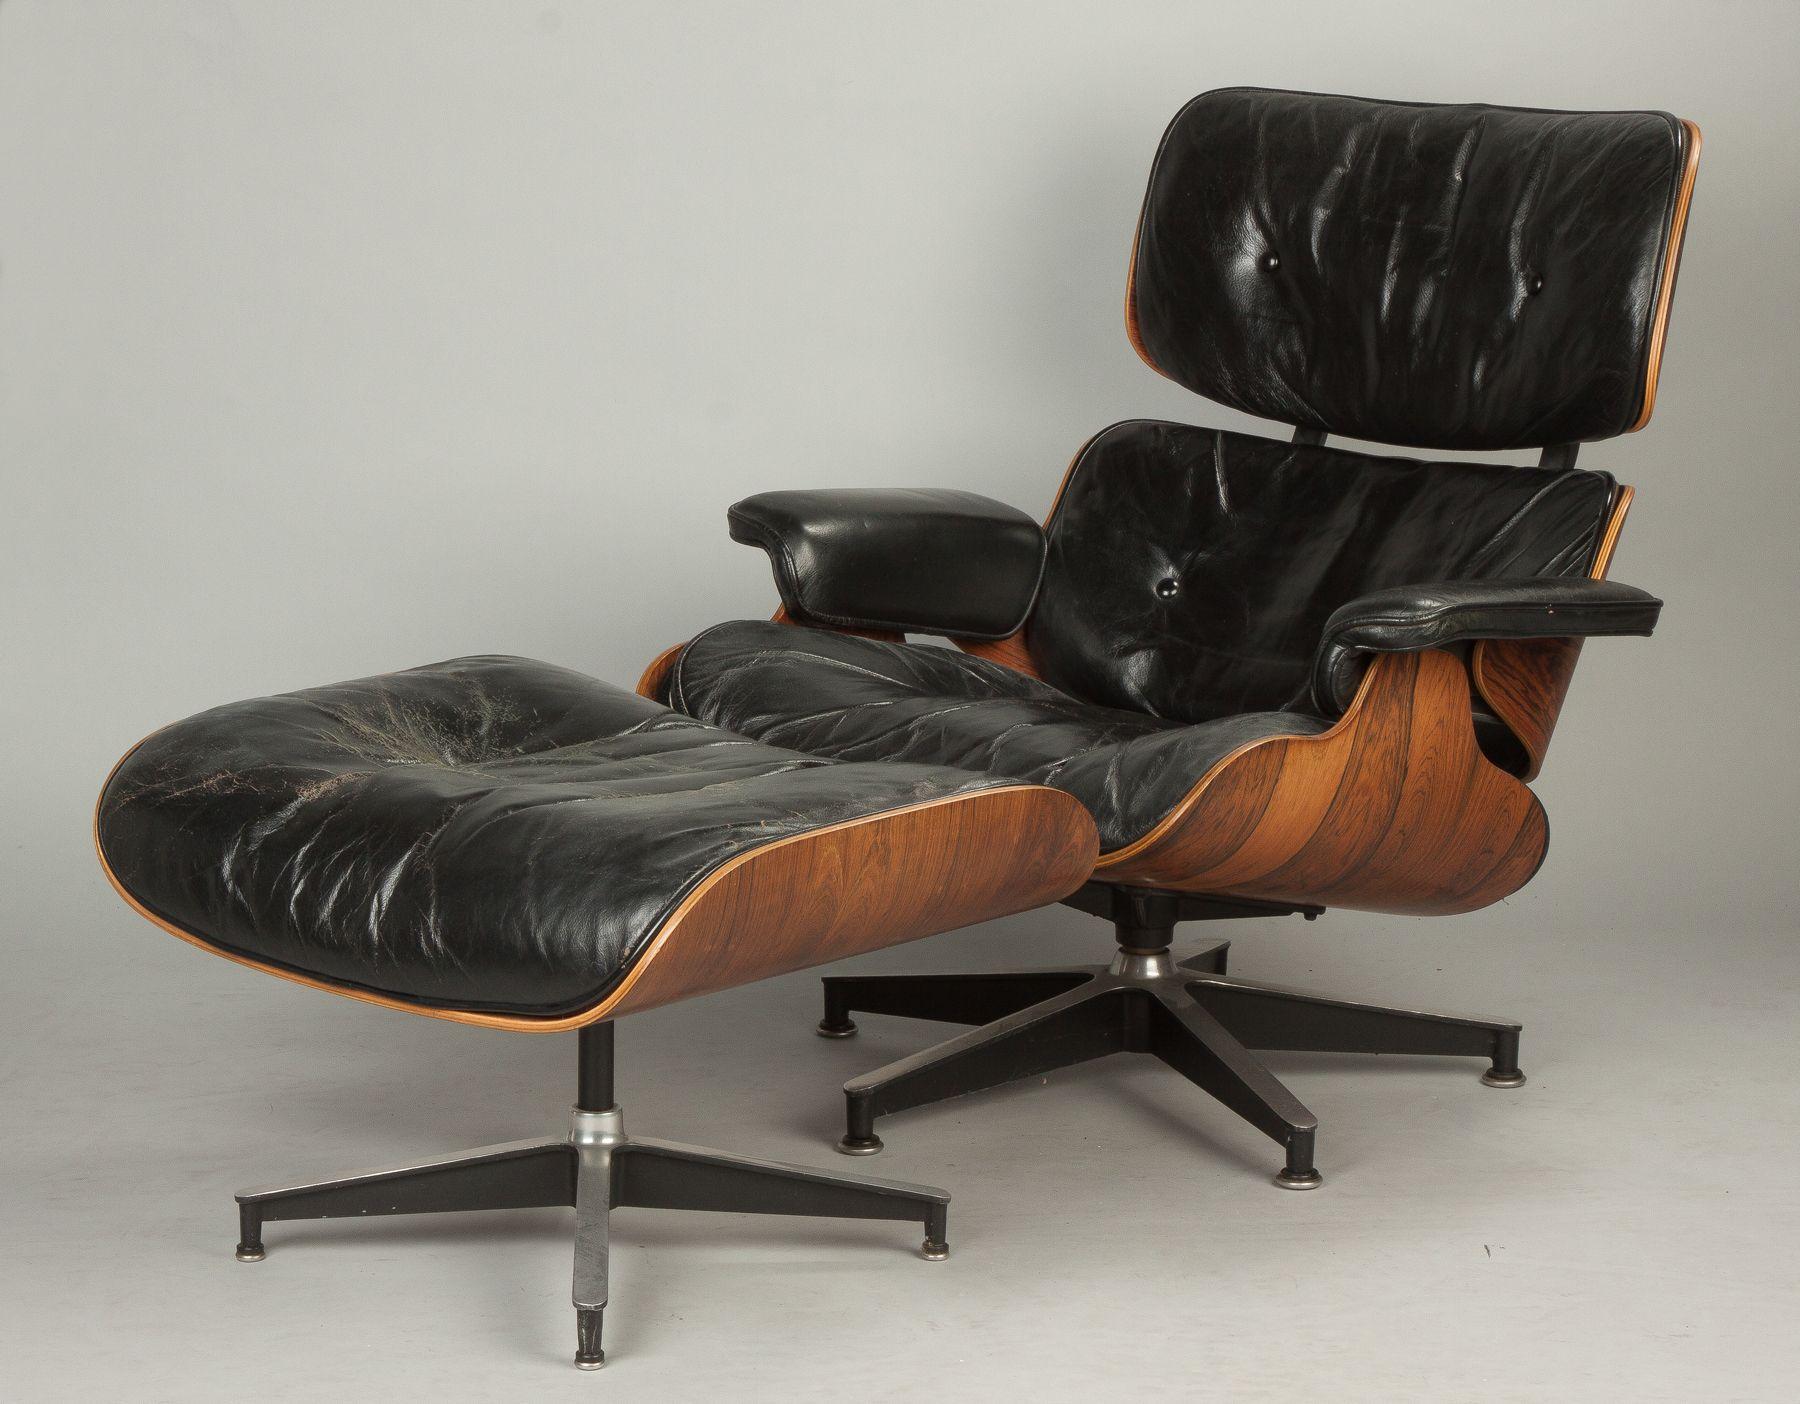 Leder Und Holz Stuhl Und Osmanischen Eames Style Leder Stuhl Nussbaum Eames Lounge Chair Eames Soft Pad Chair Charles Ea Eames Lounge Chair Chair Eames Lounge